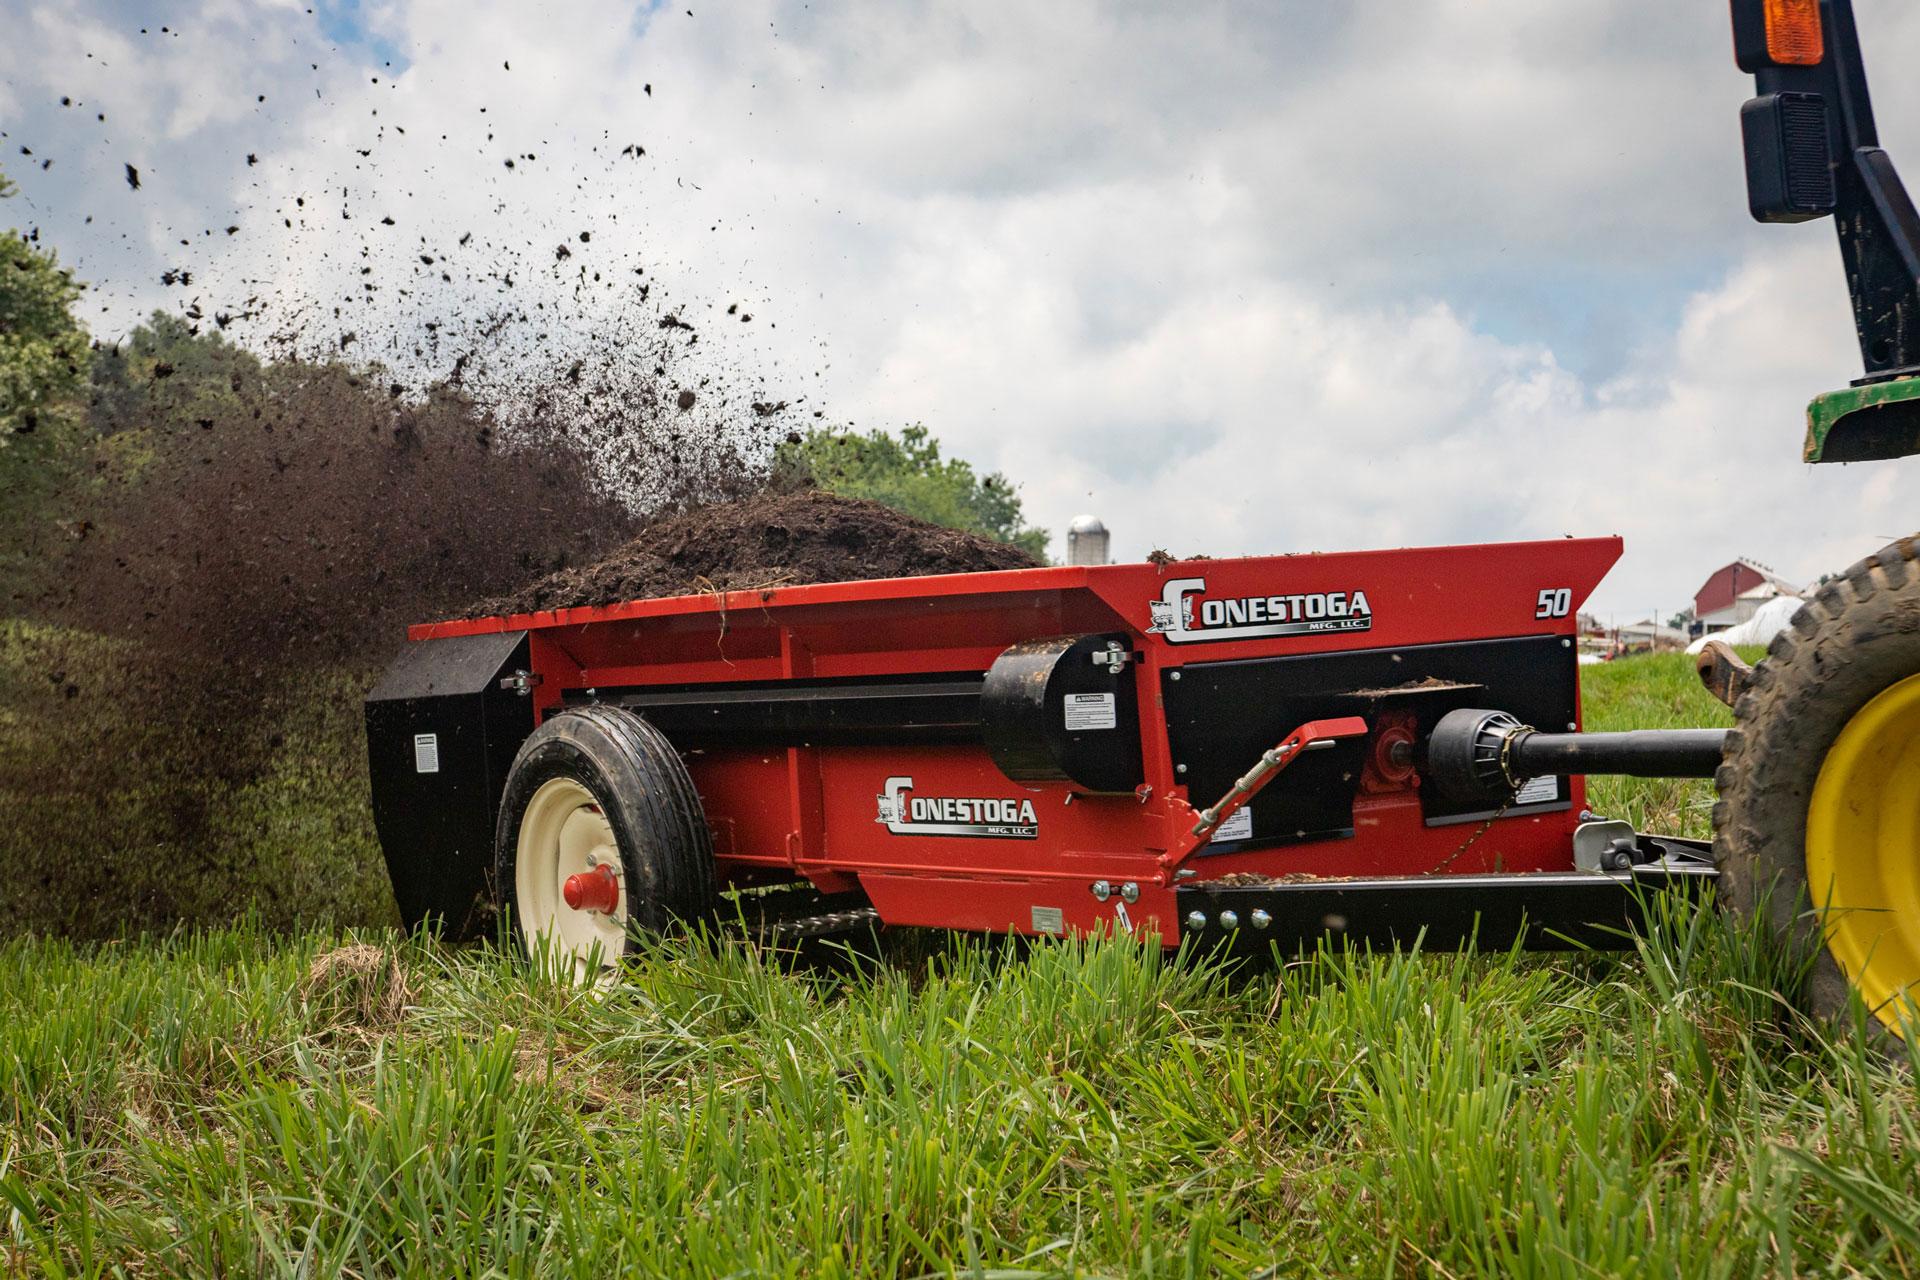 PTO manure spreader from conestoga manure spreaders in Lancaster, Pennsylvania.